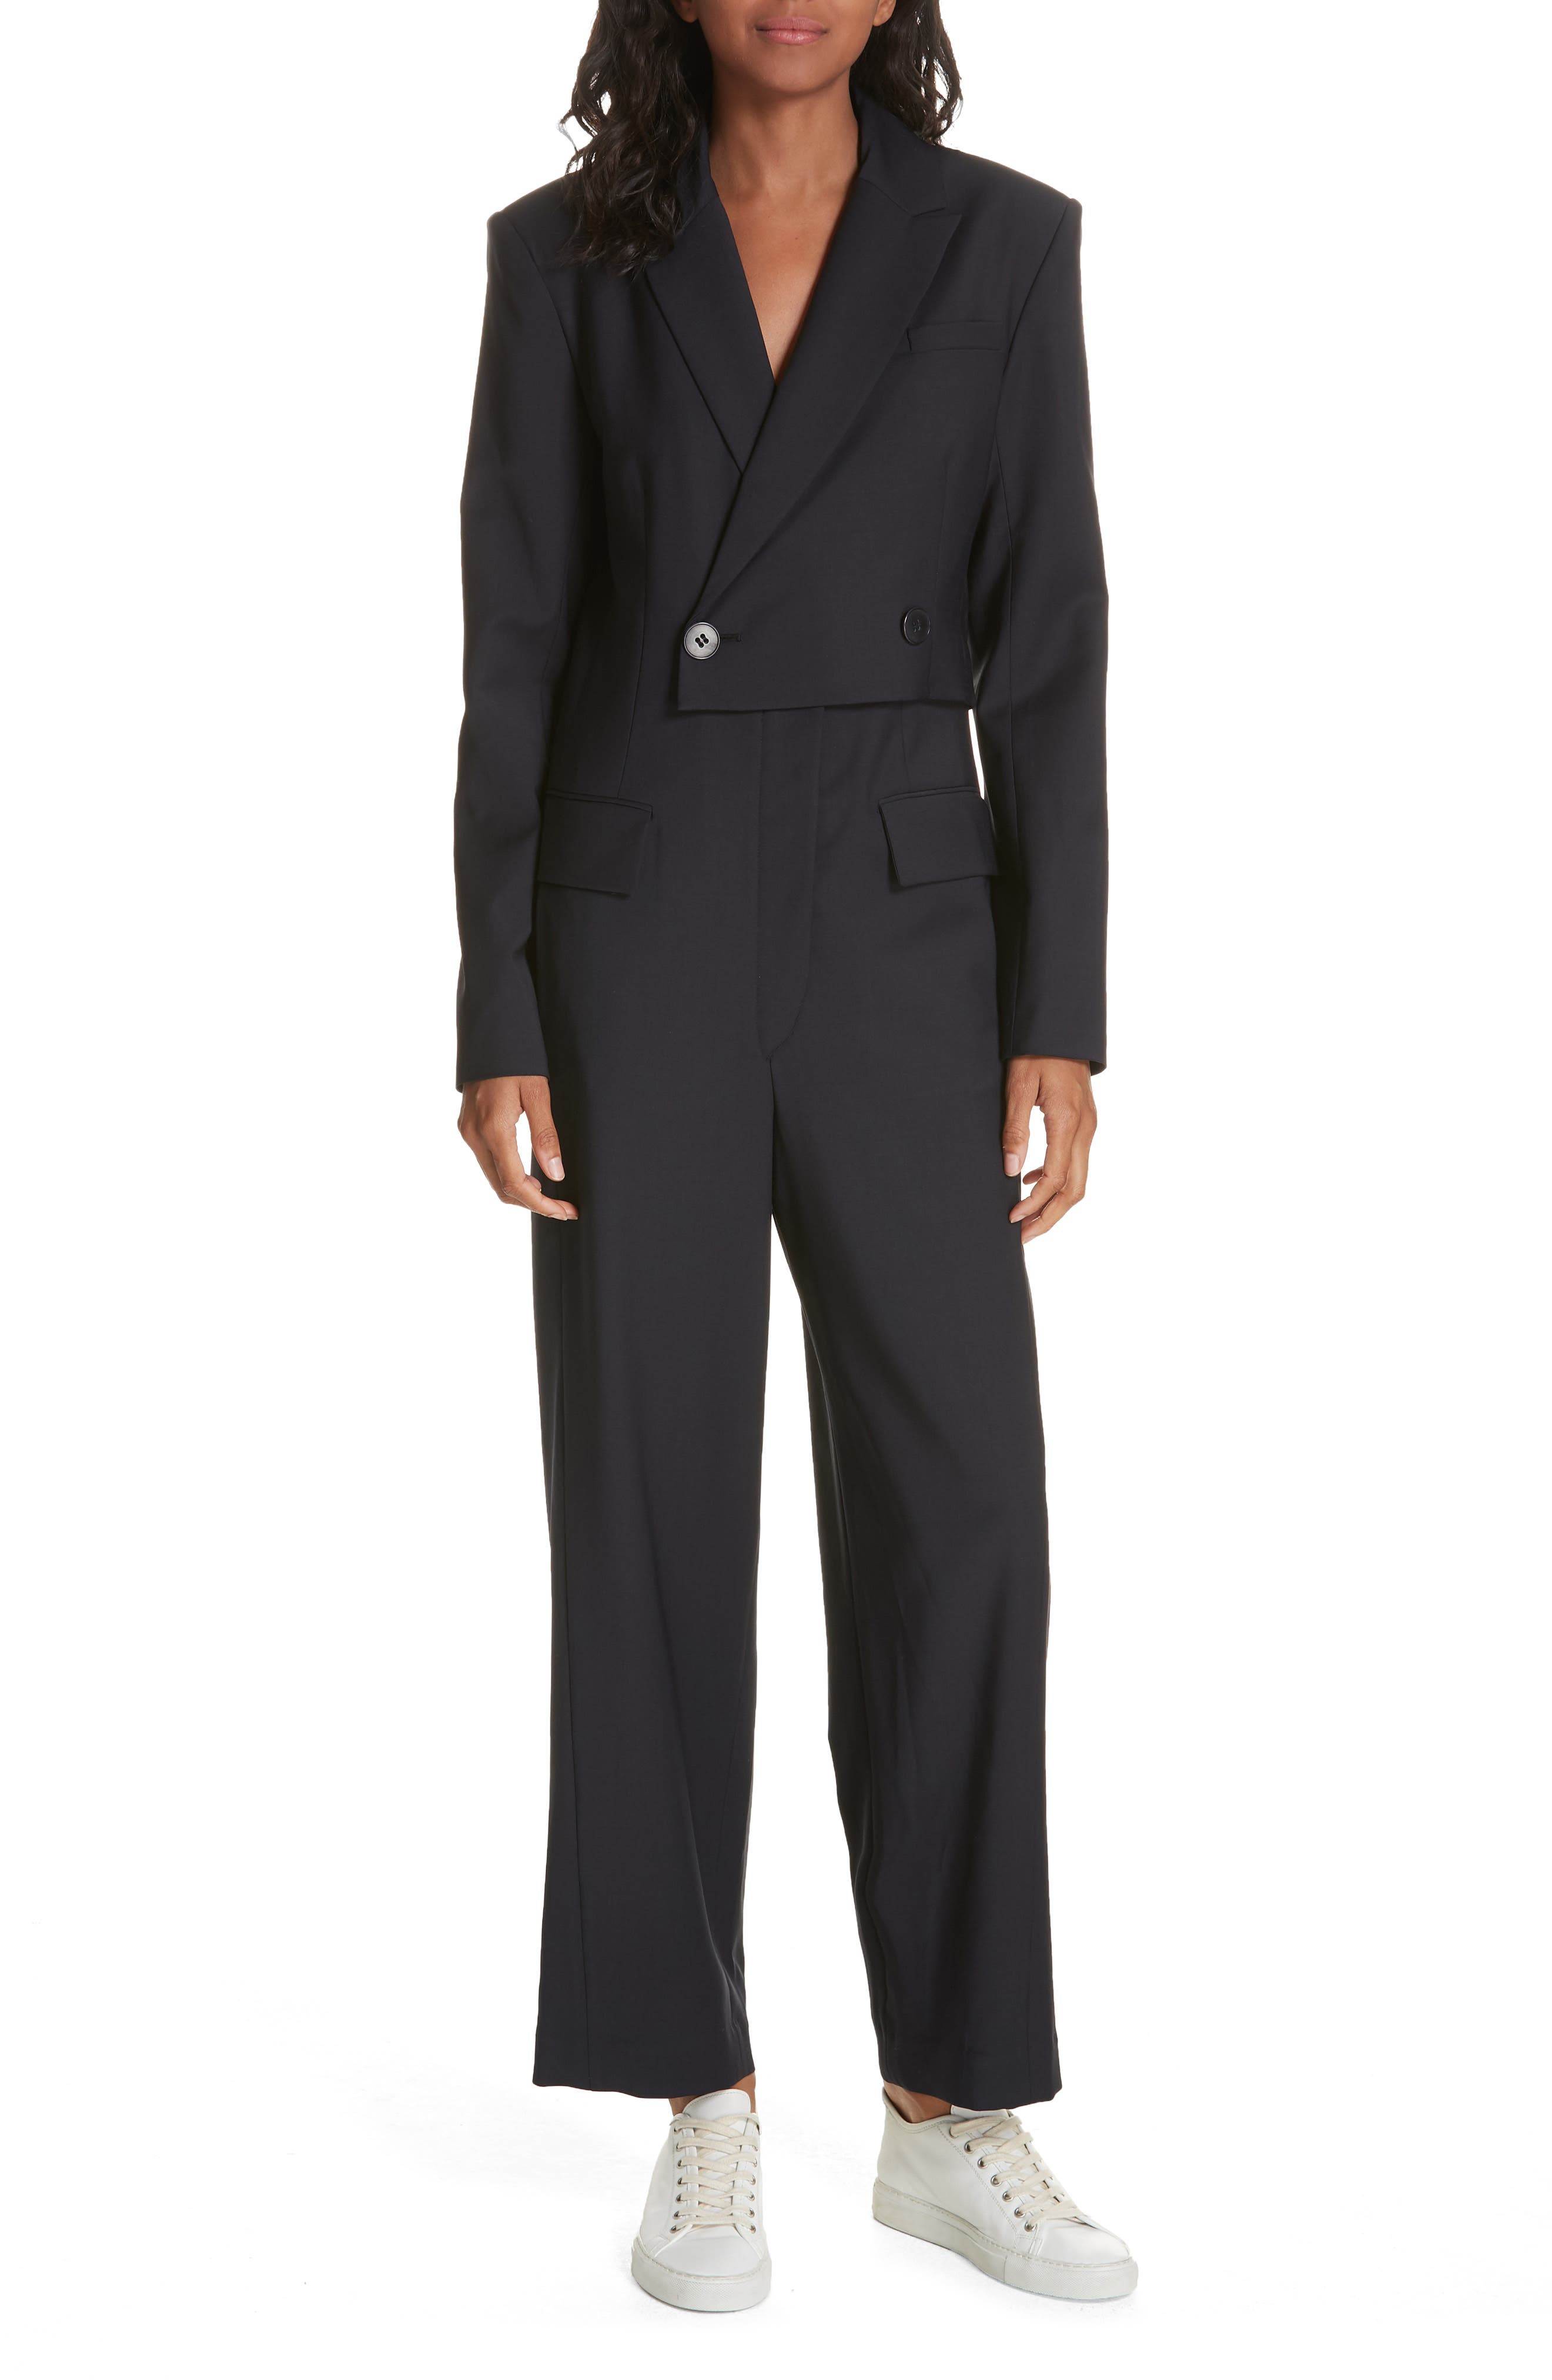 TIBI,                             Plain Weave Blazer Jumpsuit,                             Main thumbnail 1, color,                             DARK NAVY